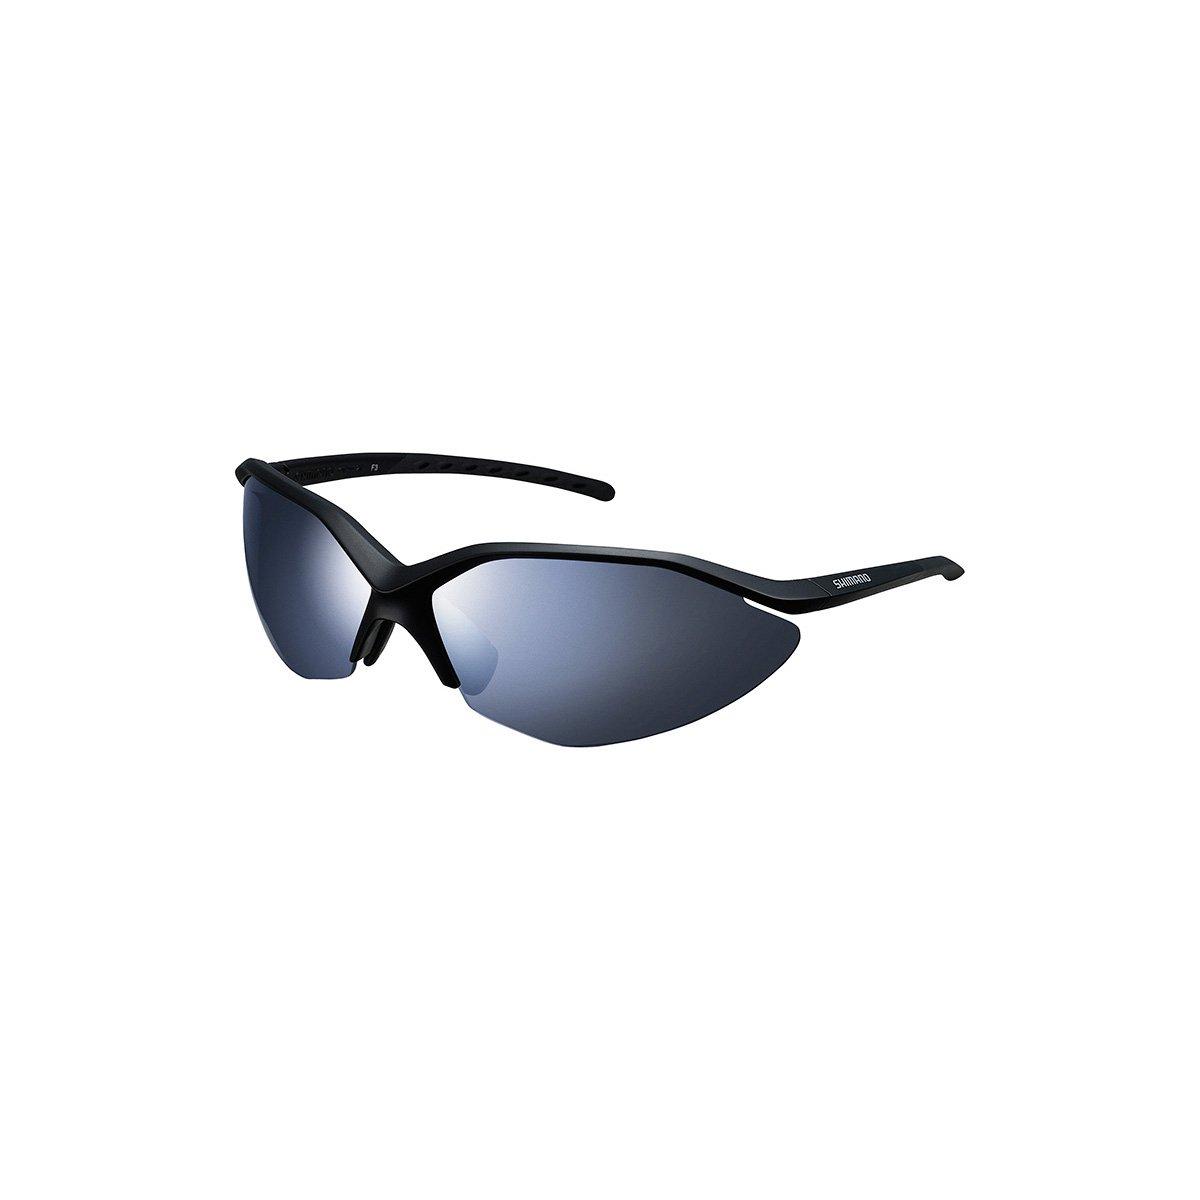 41c68d46043 Amazon.com  SHIMANO R-Series Cycling Sunglasses - S52R (MAT Black Black)   Sports   Outdoors